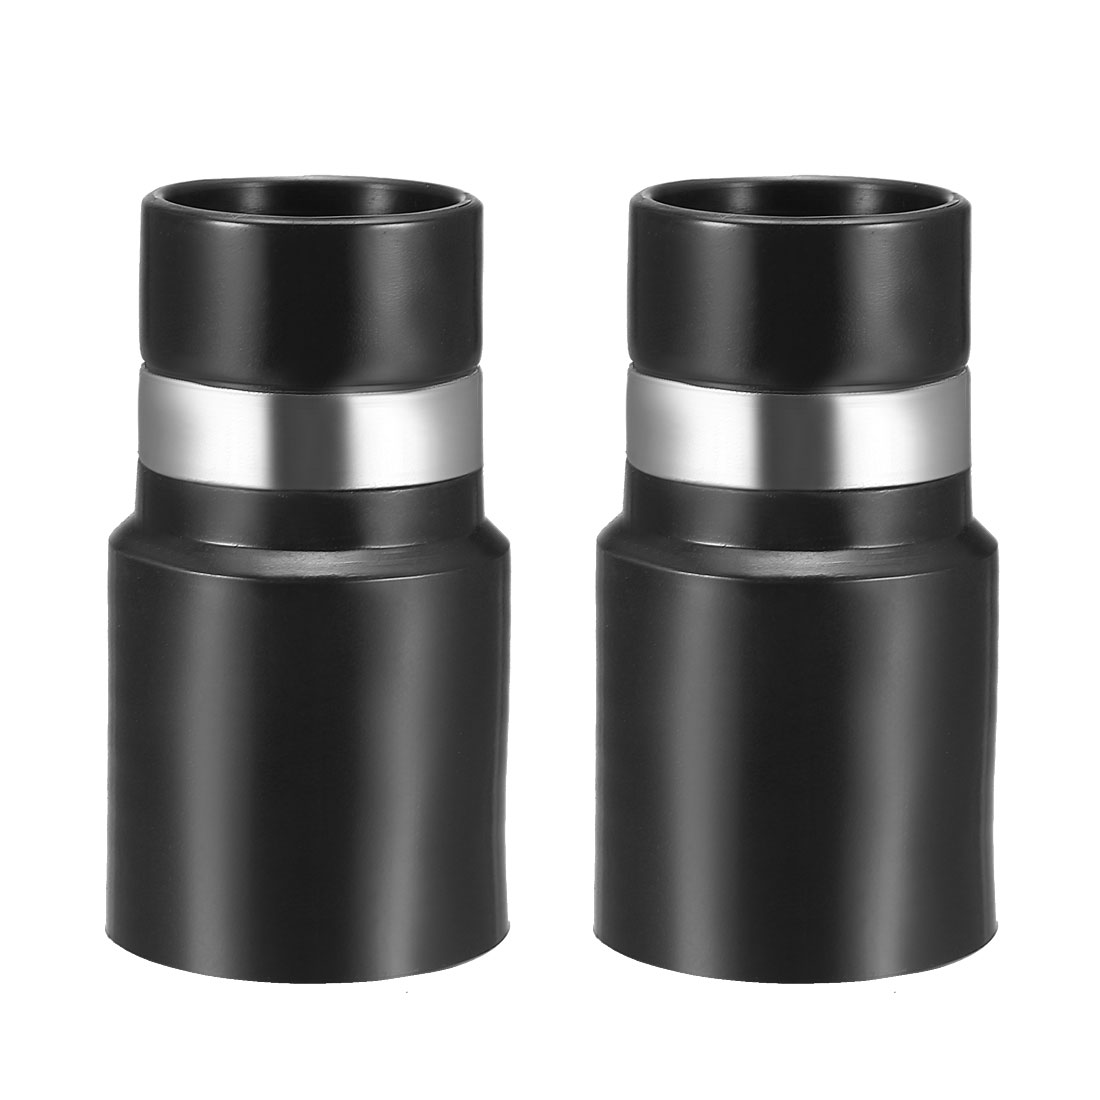 Central Vacuum Cleaner Hose Adapter Connector 32mm Plastic Black 2Pcs